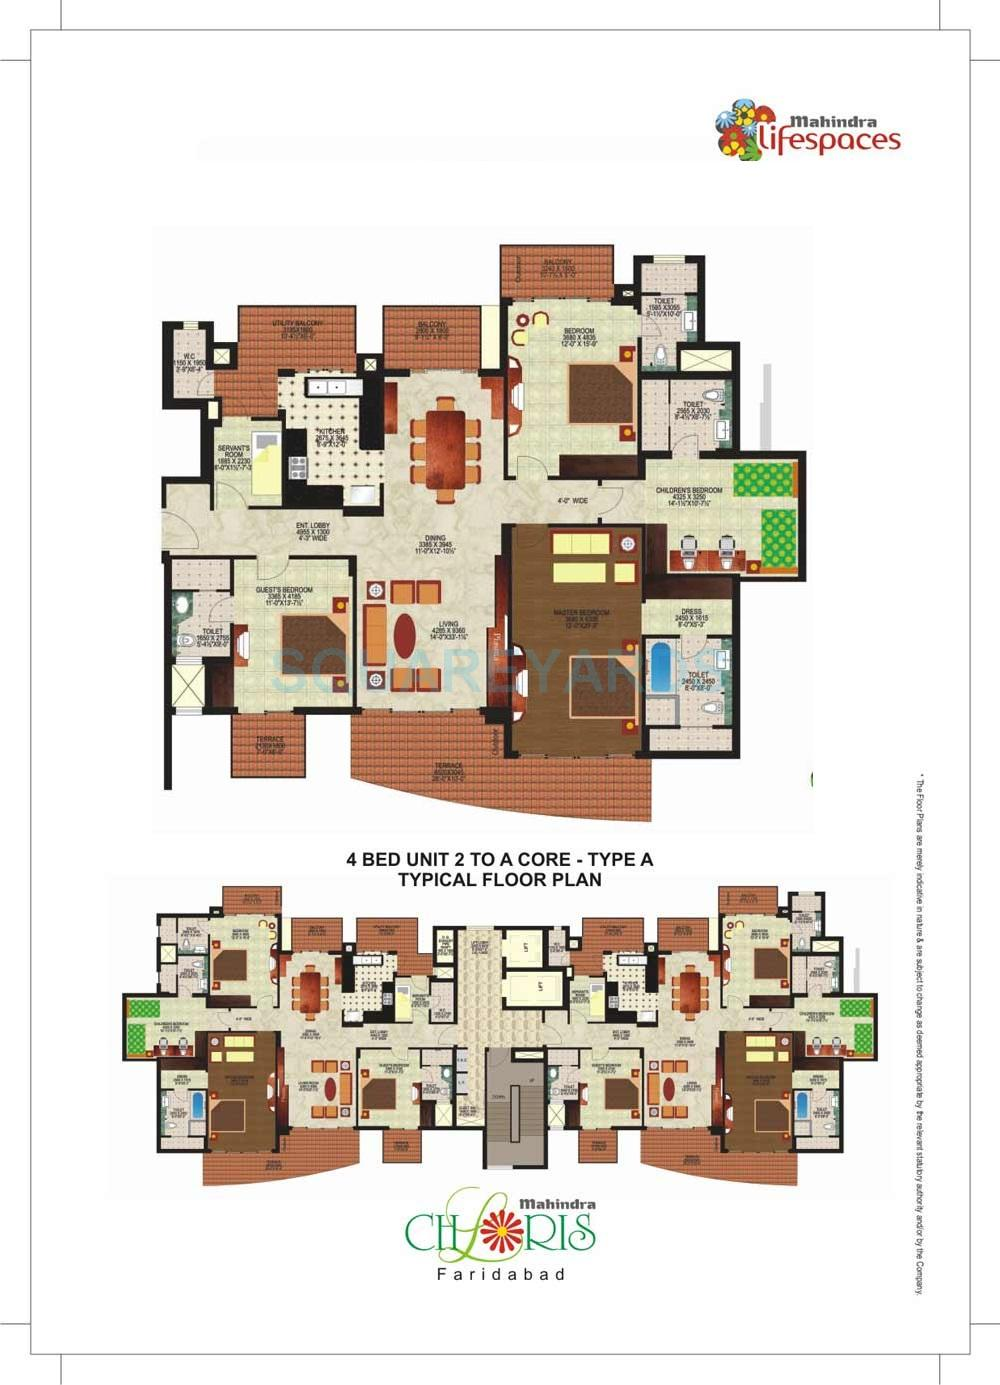 mahindra lifespaces chloris apartment 4bhk 2900sqft 1